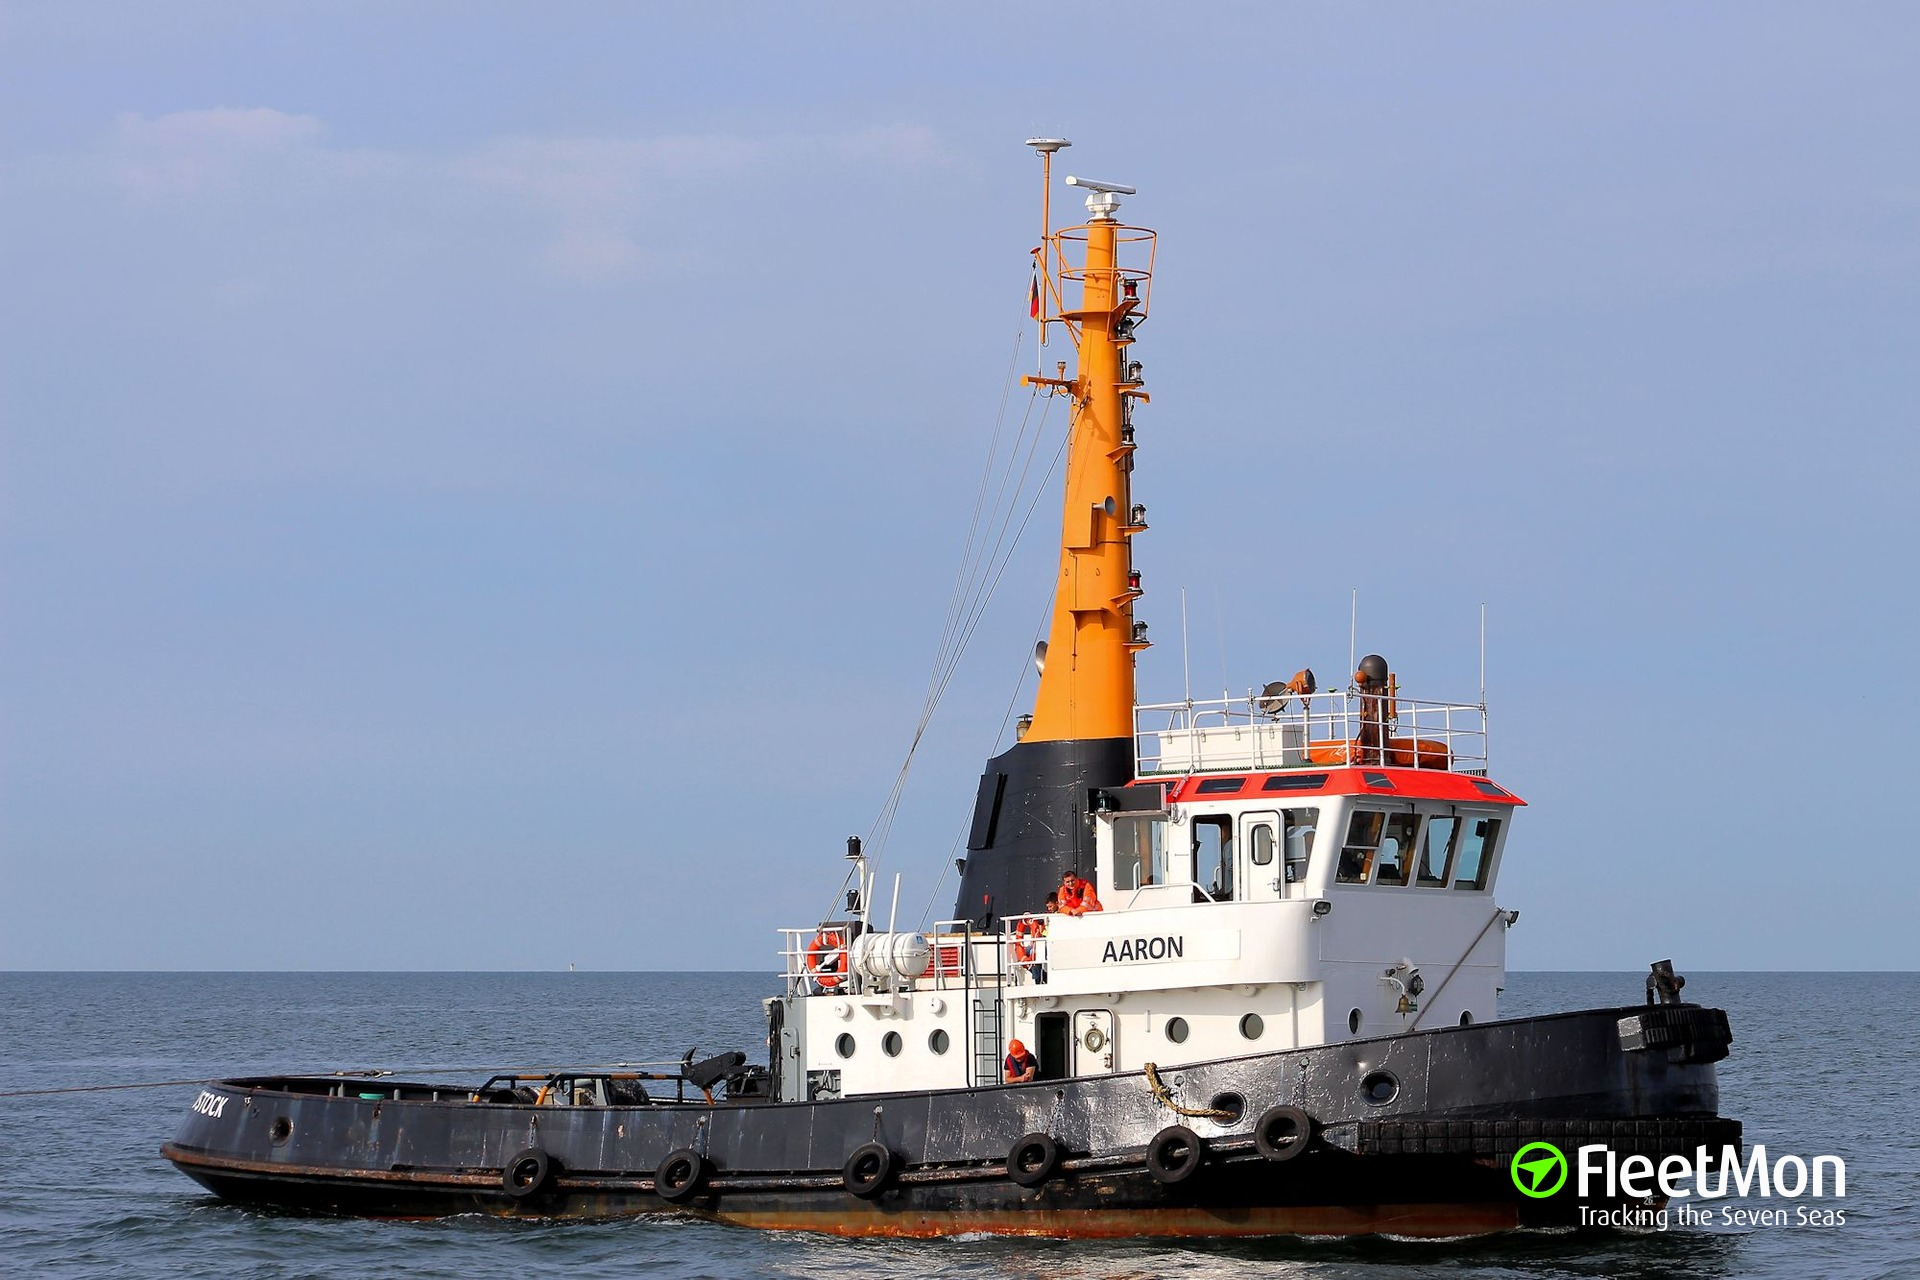 Breakaway barge ran aground, Baltic sea